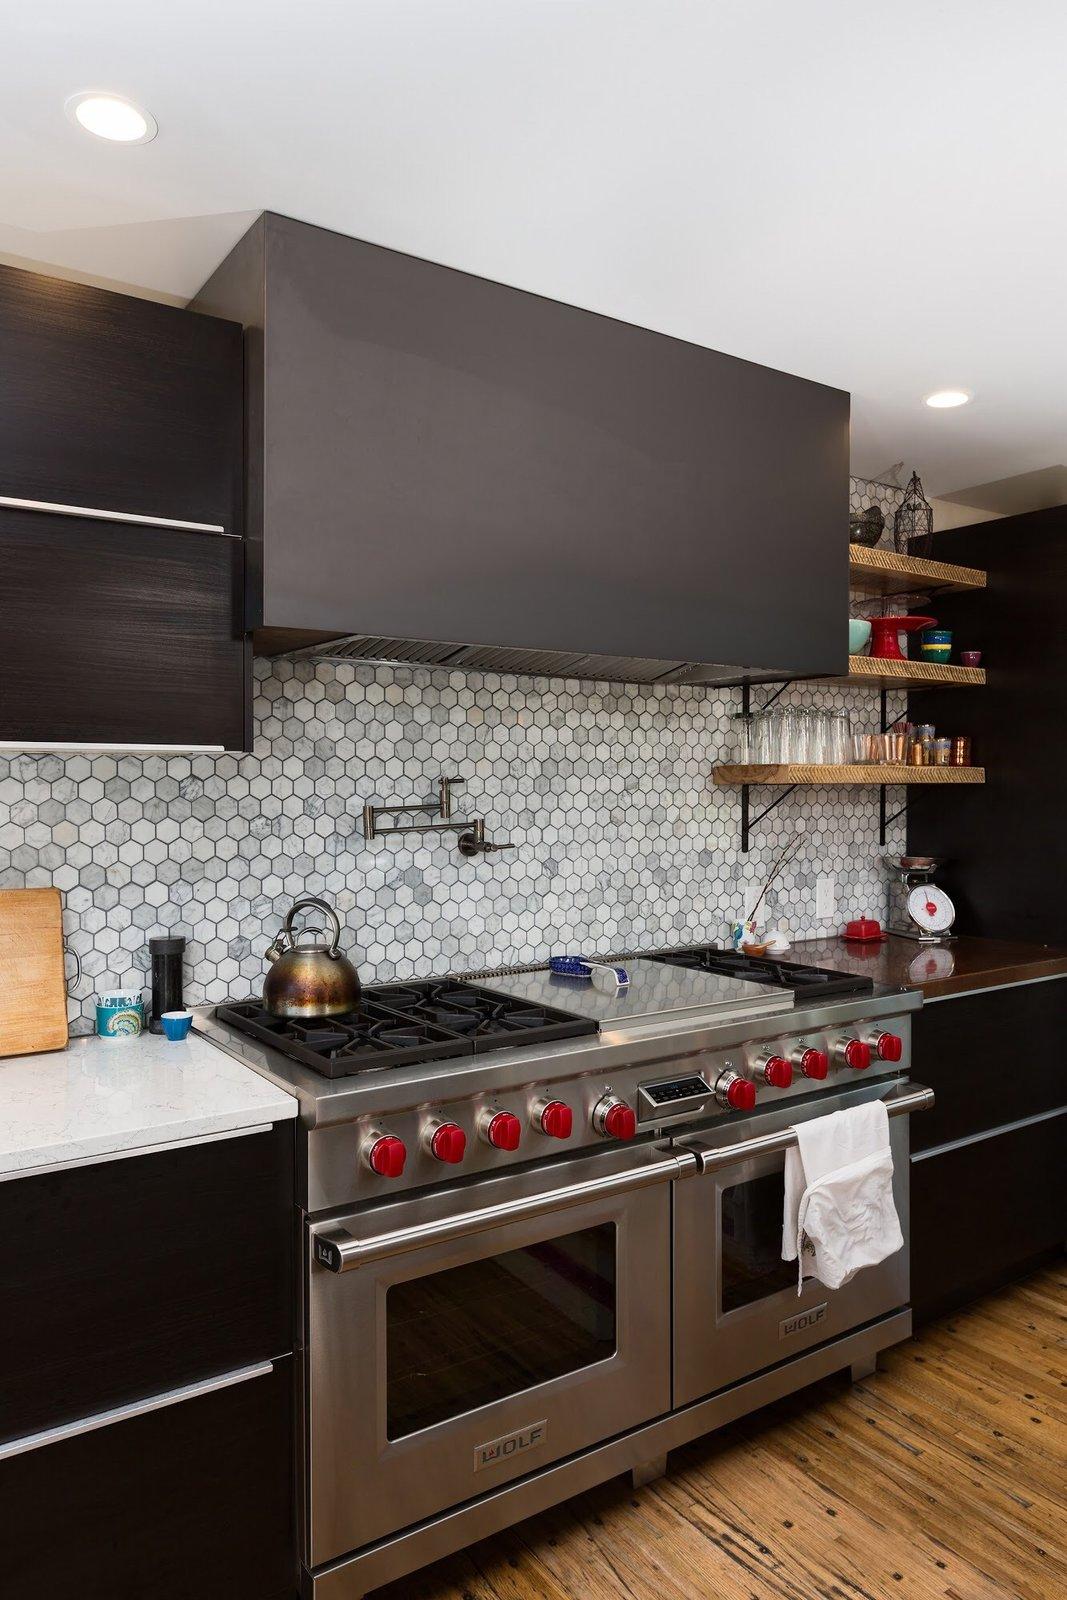 Kitchen, Engineered Quartz Counter, White Cabinet, Wood Cabinet, Stone Tile Backsplashe, Pendant Lighting, Ceiling Lighting, Range, and Range Hood Chris Boylen Photography  The Container house